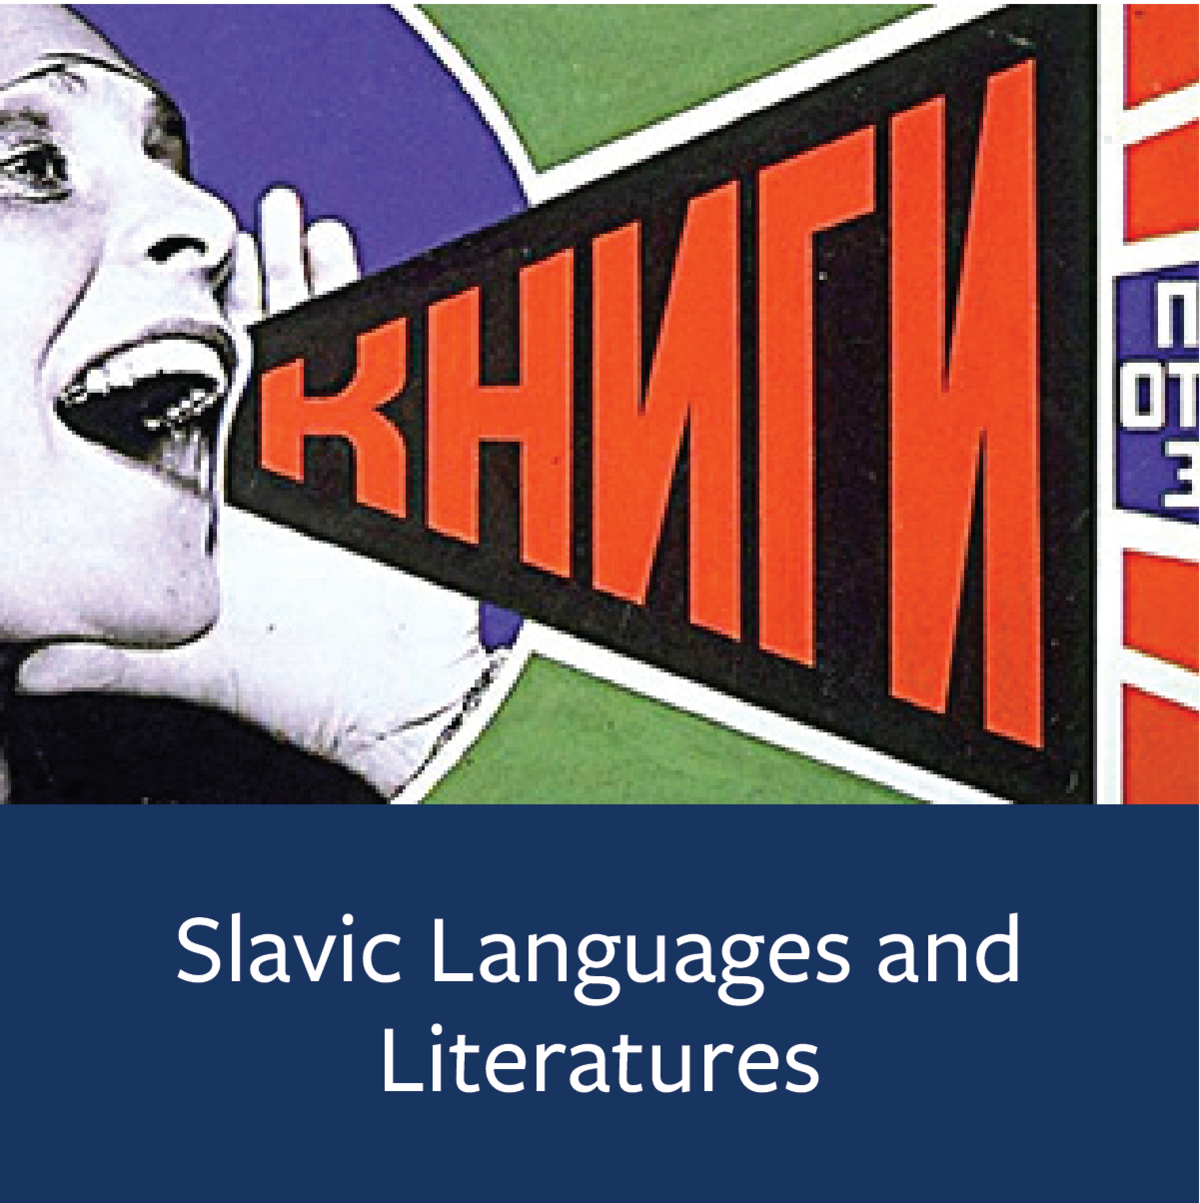 Slavic Languages and Literature Major Map